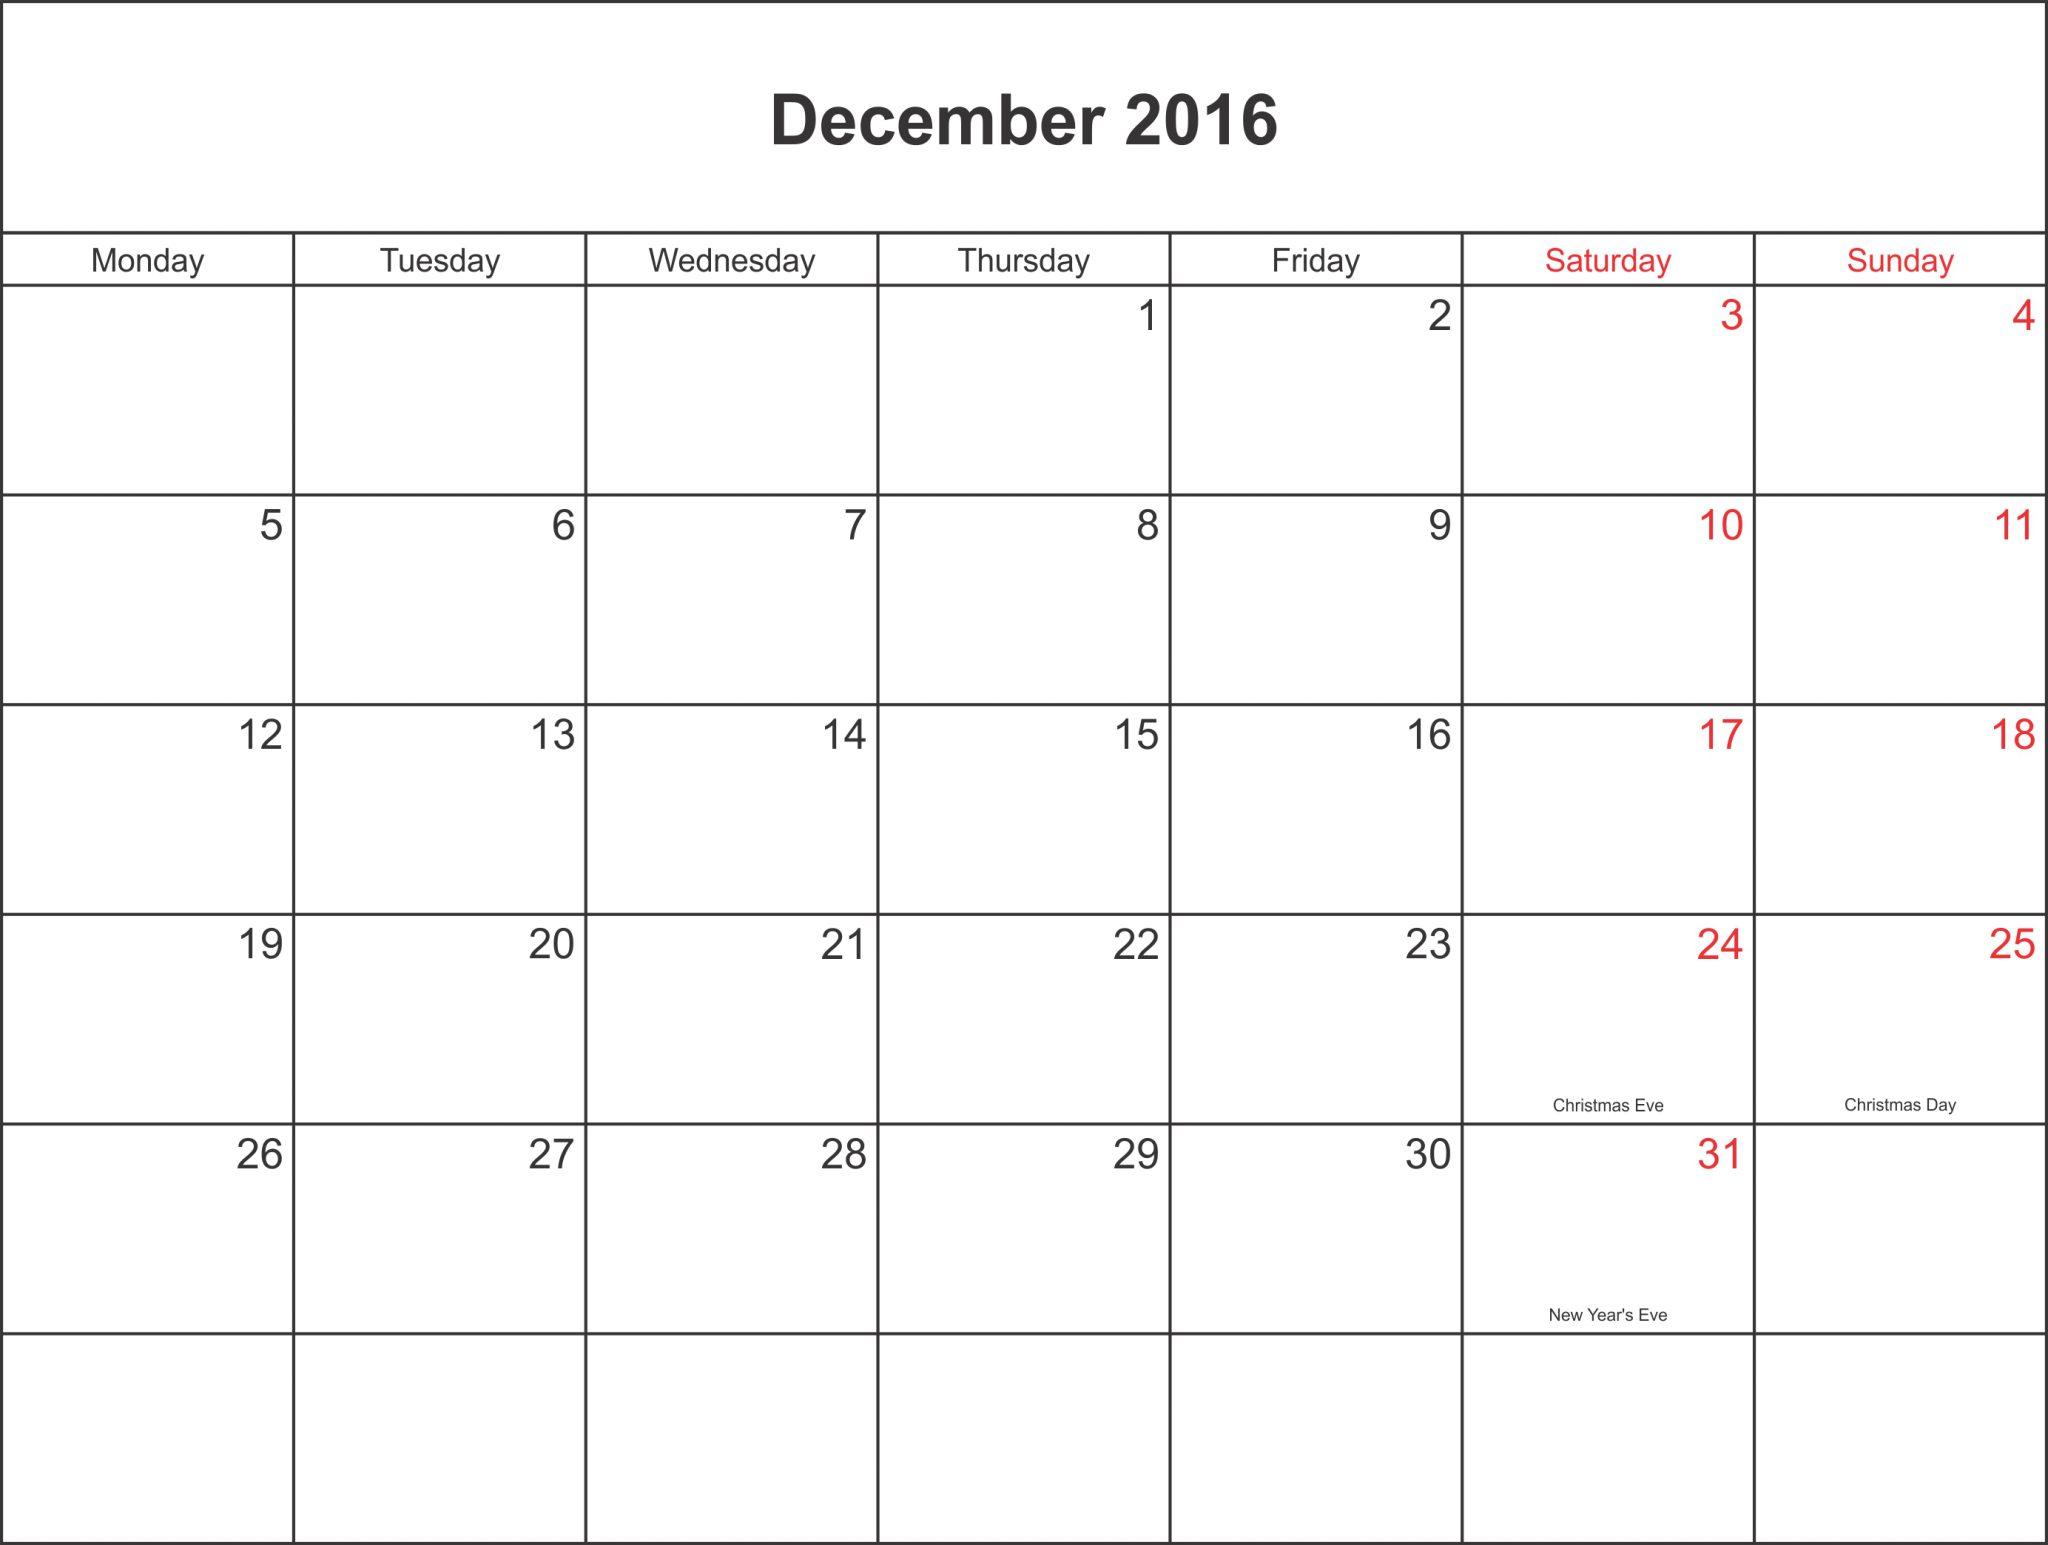 Blank Calendar Template Pdf : Blank december calendar templates printable word pdf